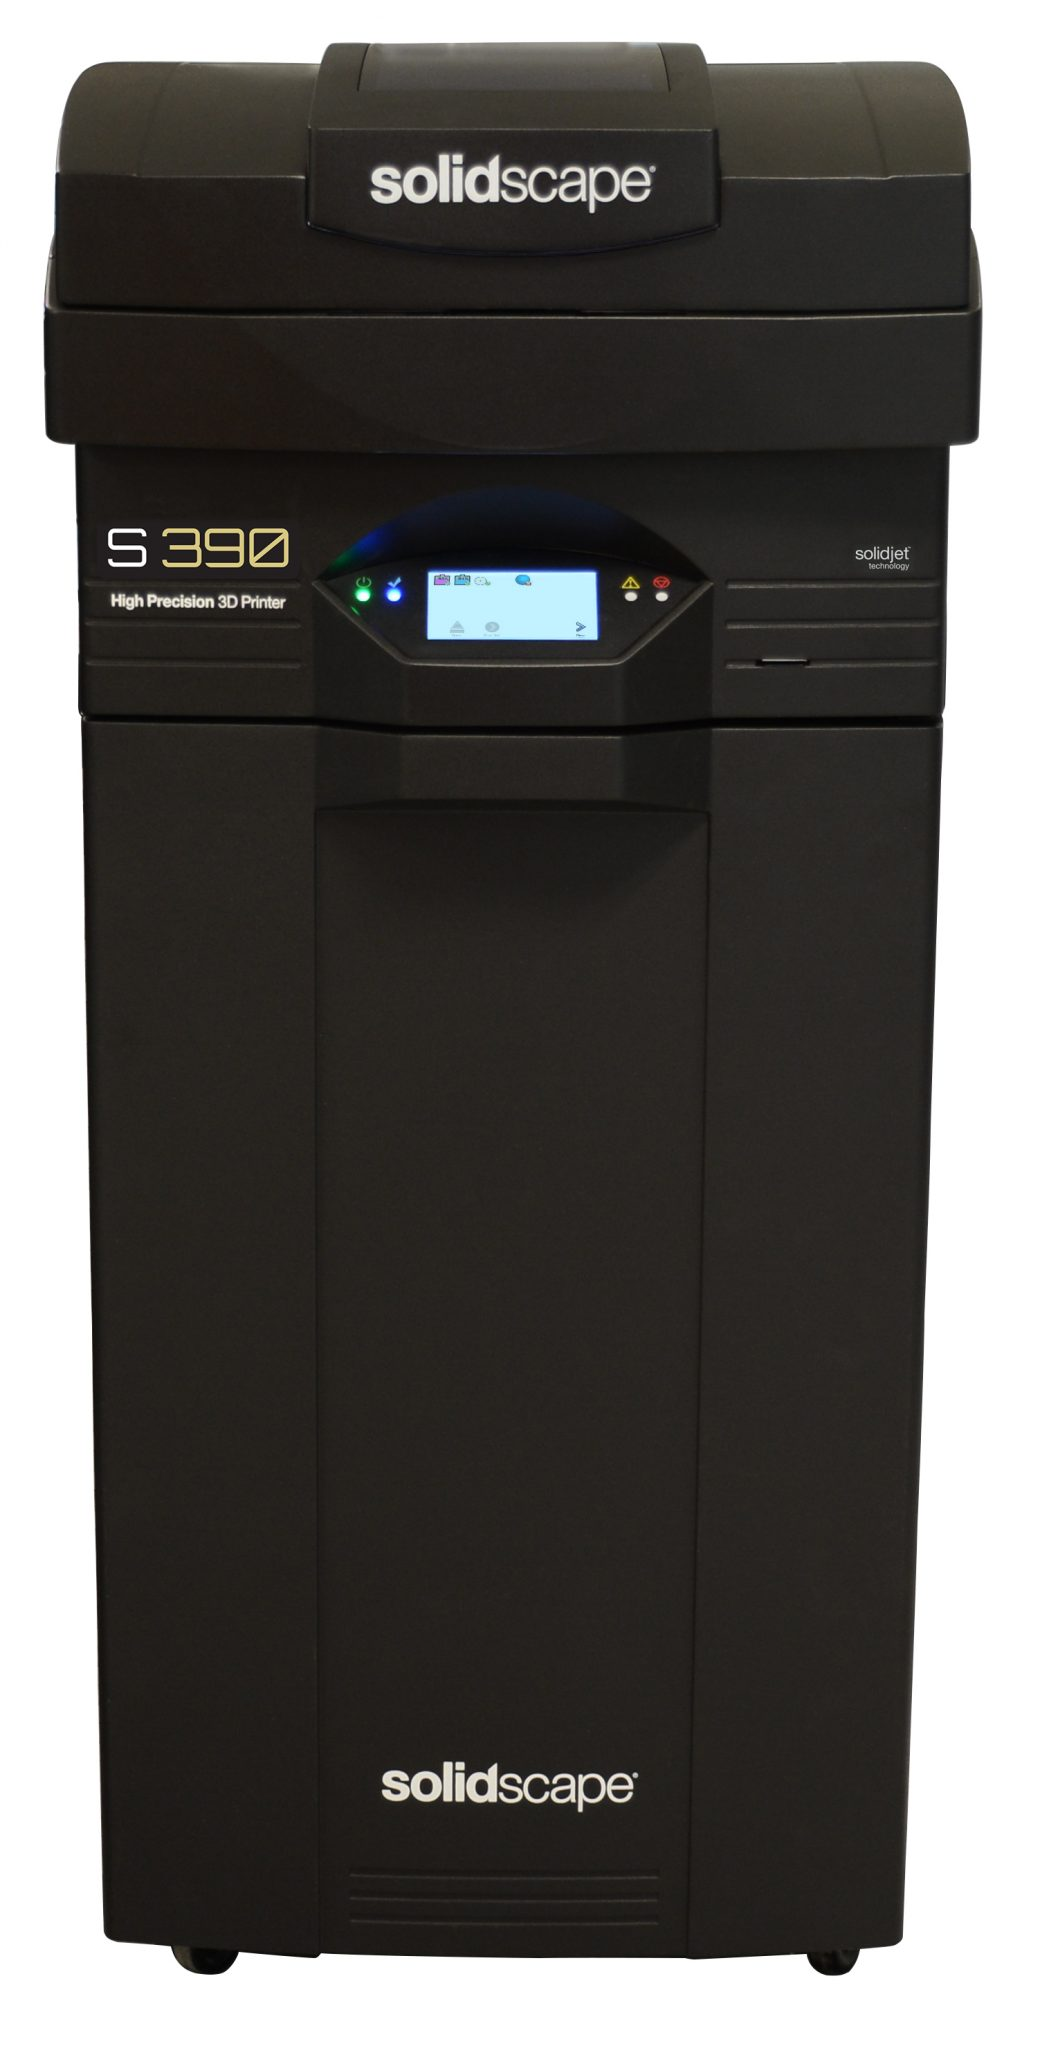 The Solidscape S390 on its base. Photo via Solidscape.